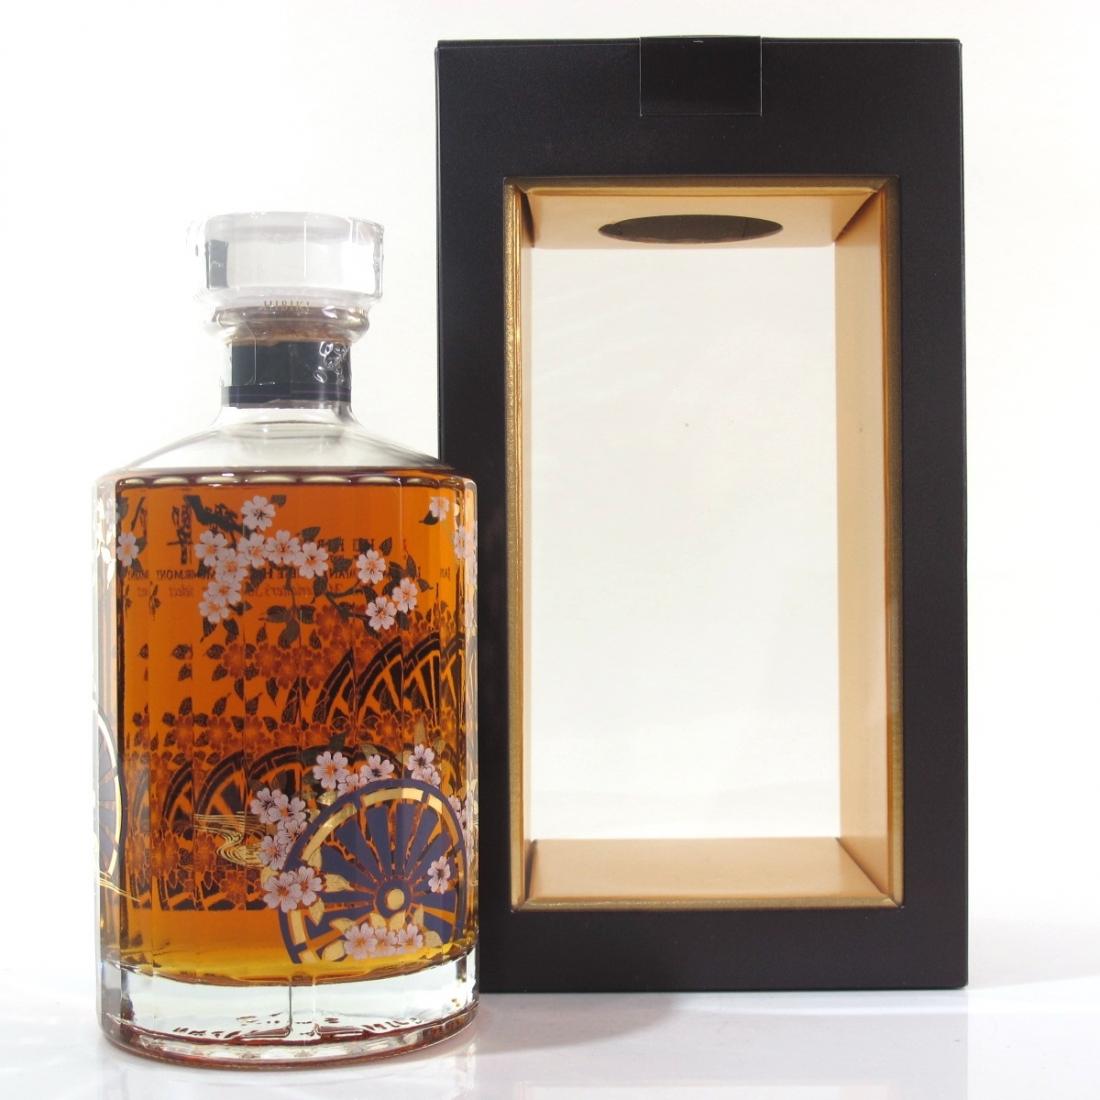 Hibiki Japanese Harmony Master's Select Limited Edition